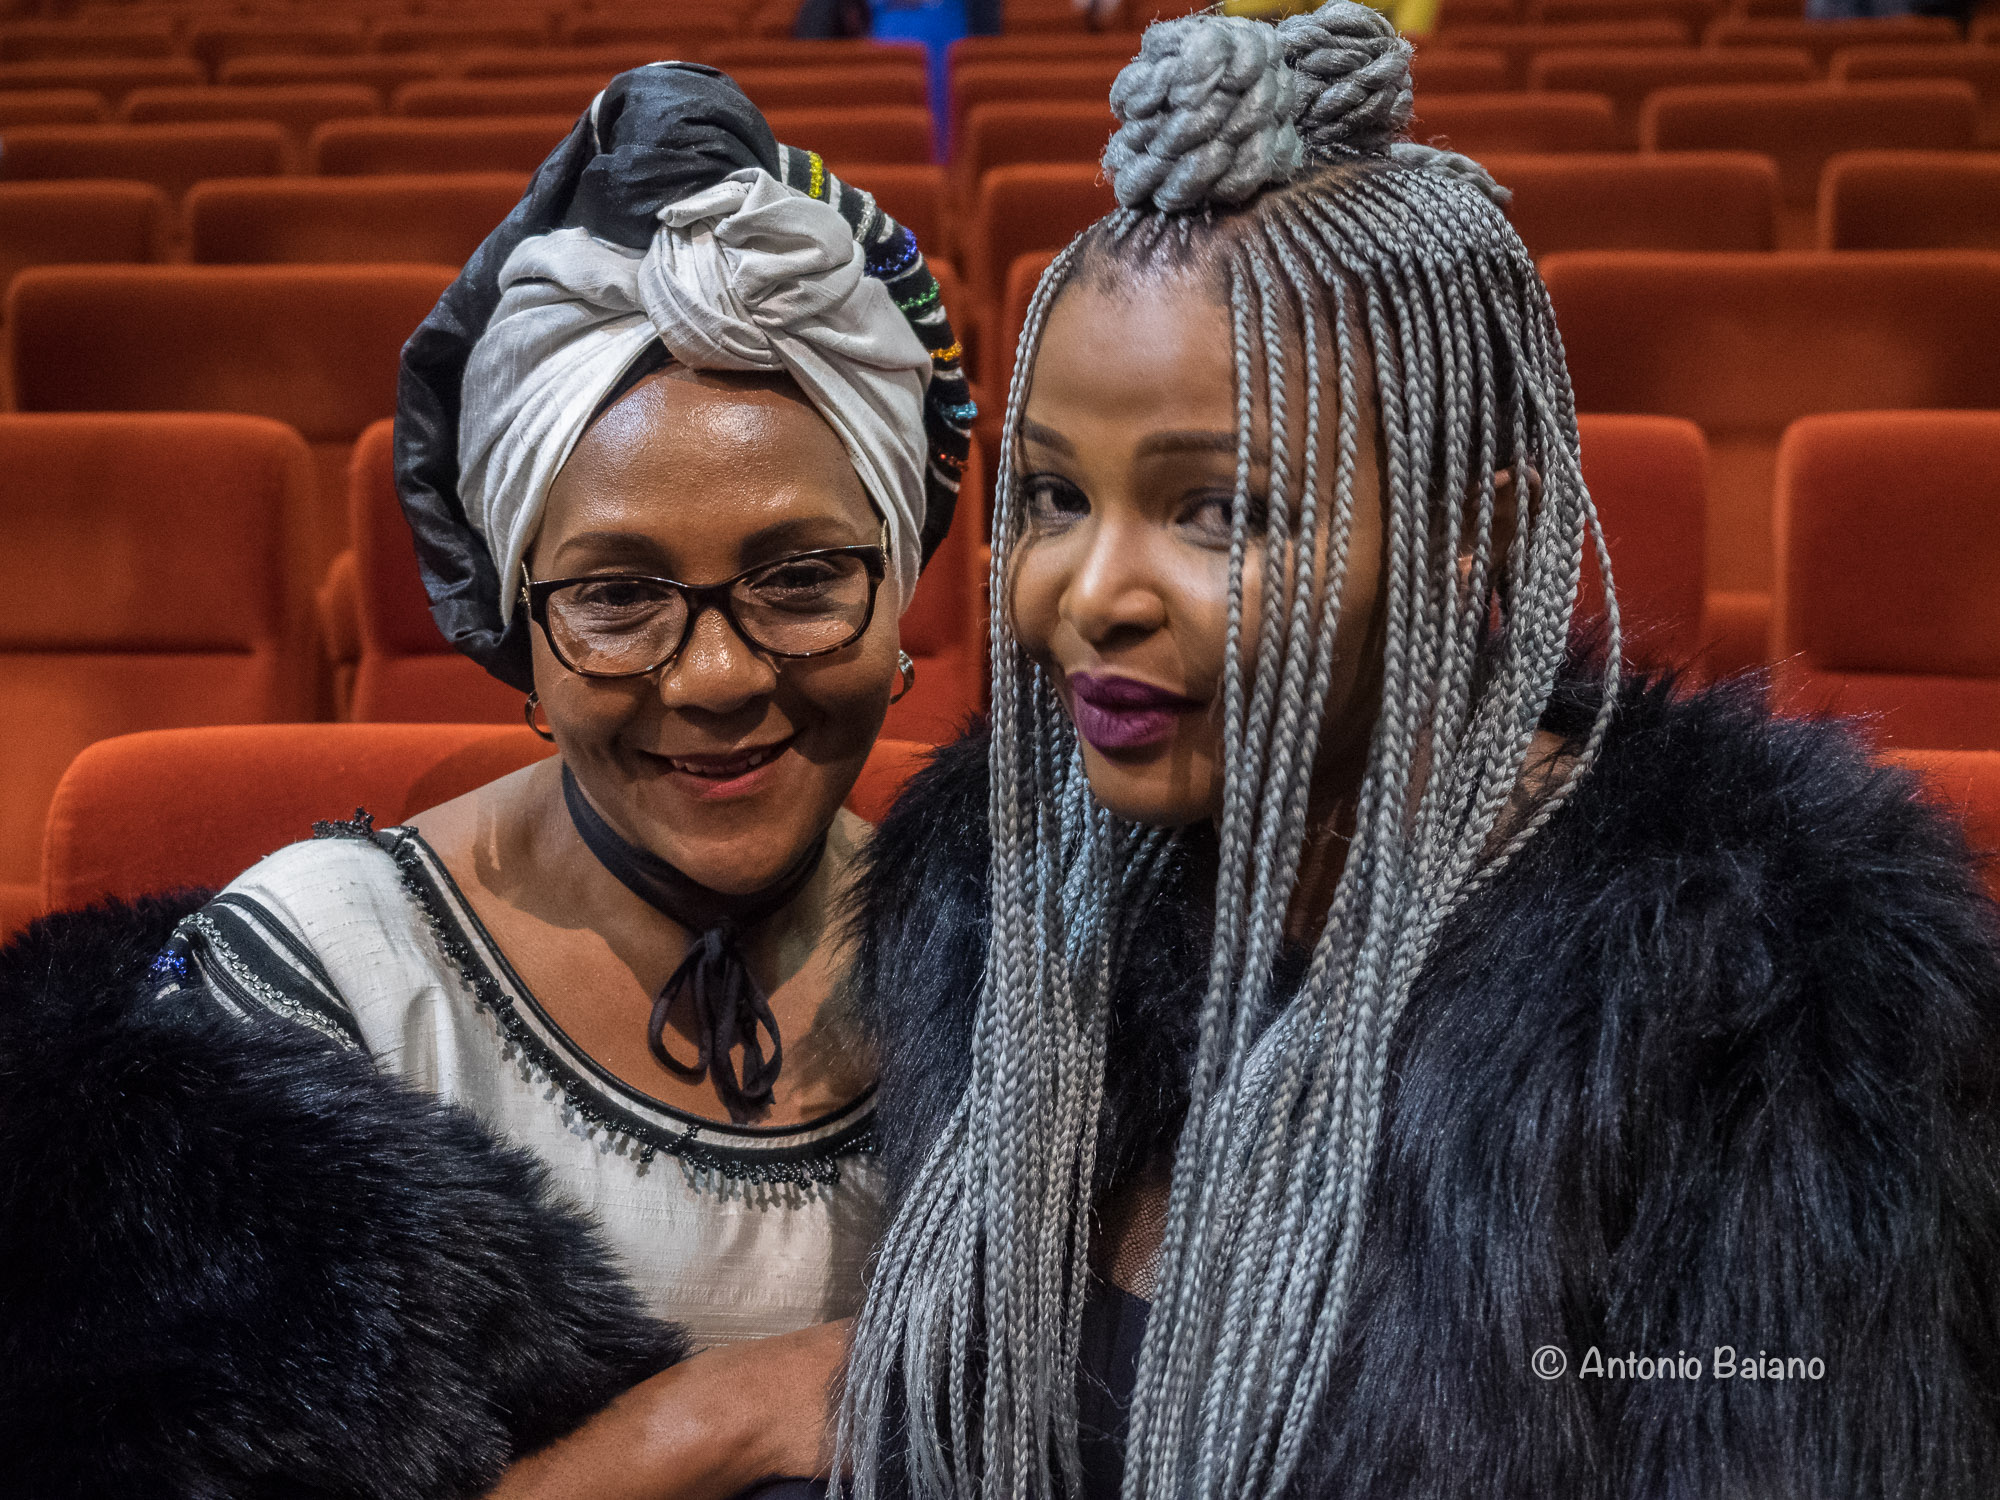 Ndileka Mandela and Simphiwe Dana